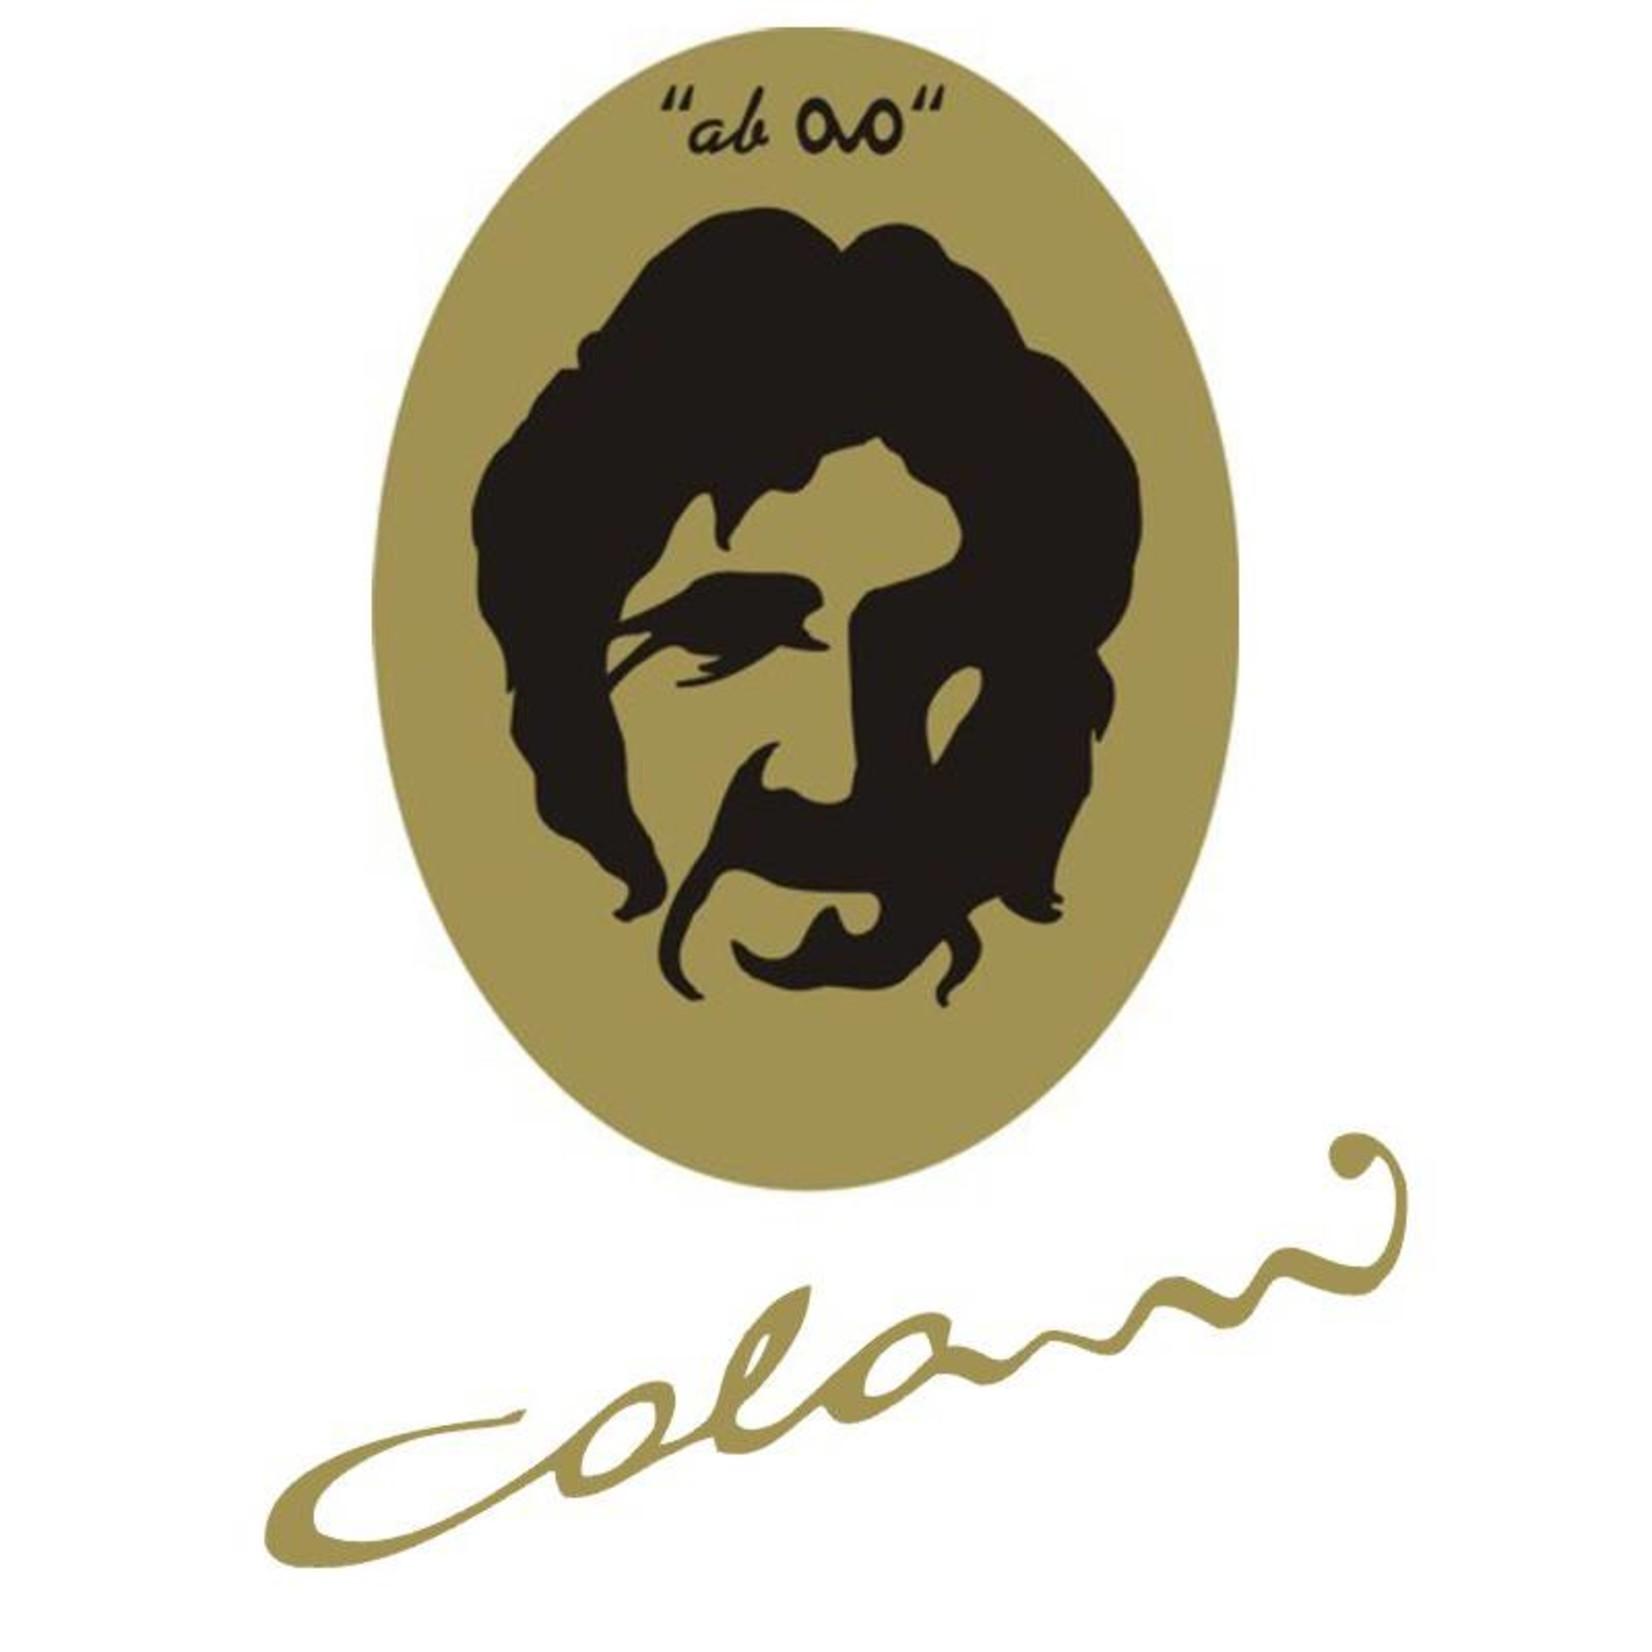 Colani Porzellanserie Luigi Colani Kaffeebecher aus Porzellan in Schwarz